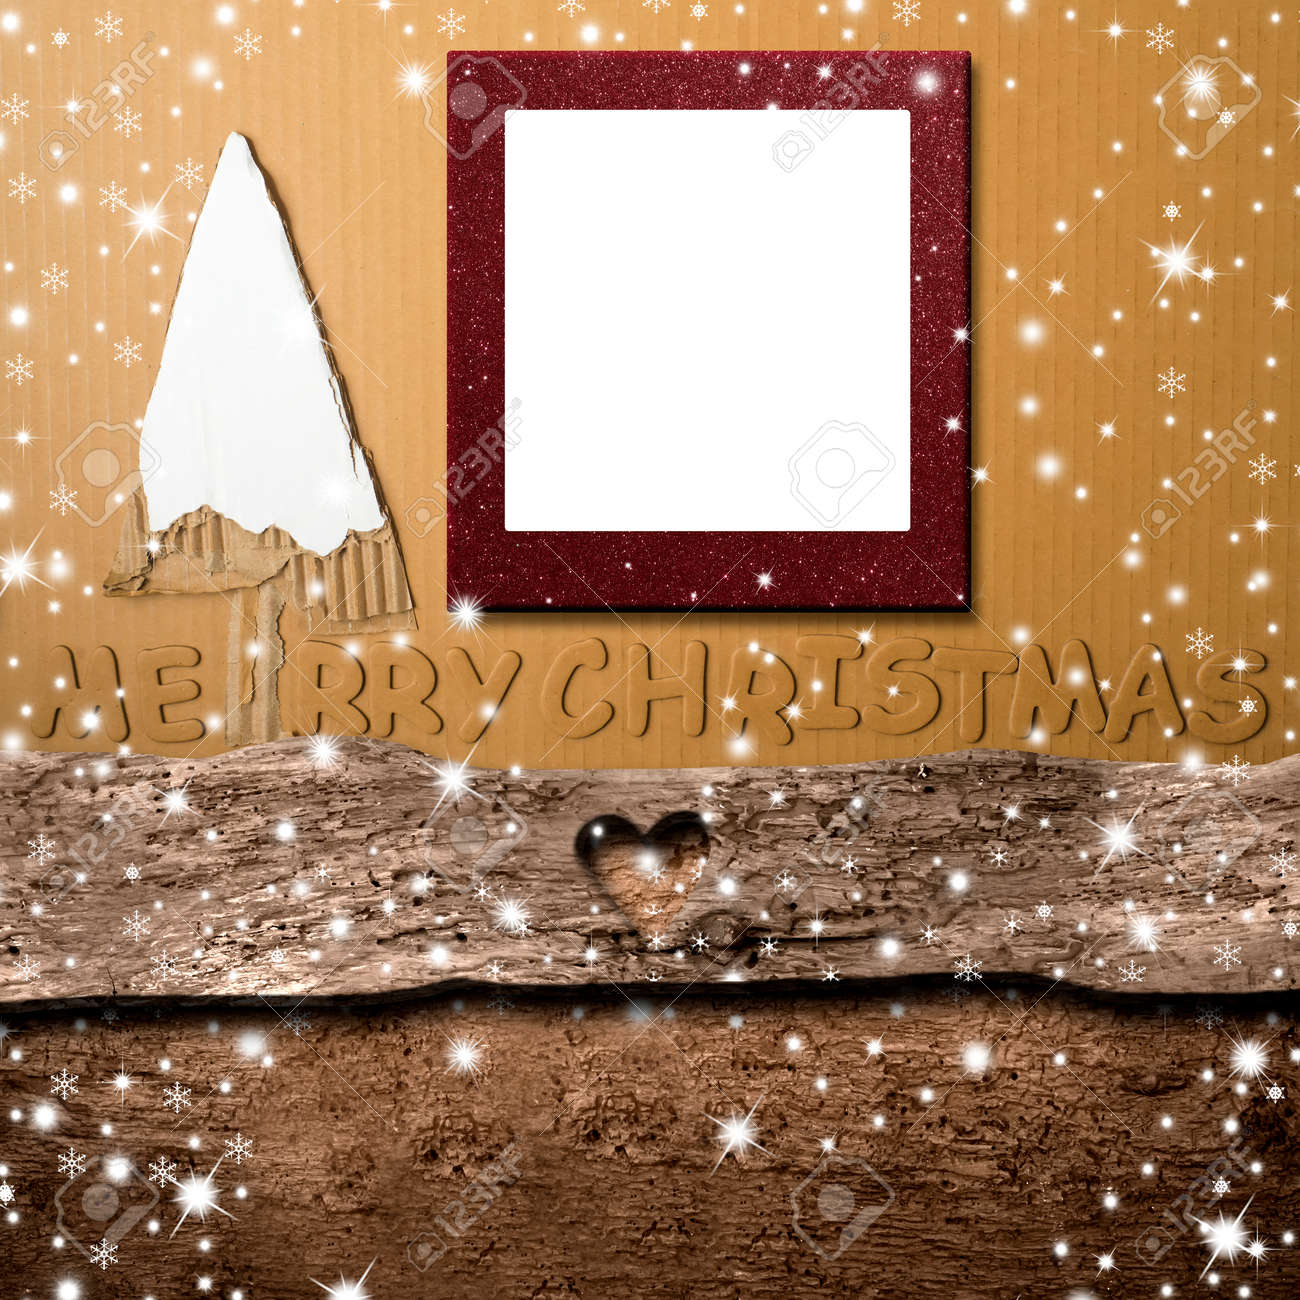 Weihnachten Fotorahmen.Stock Photo